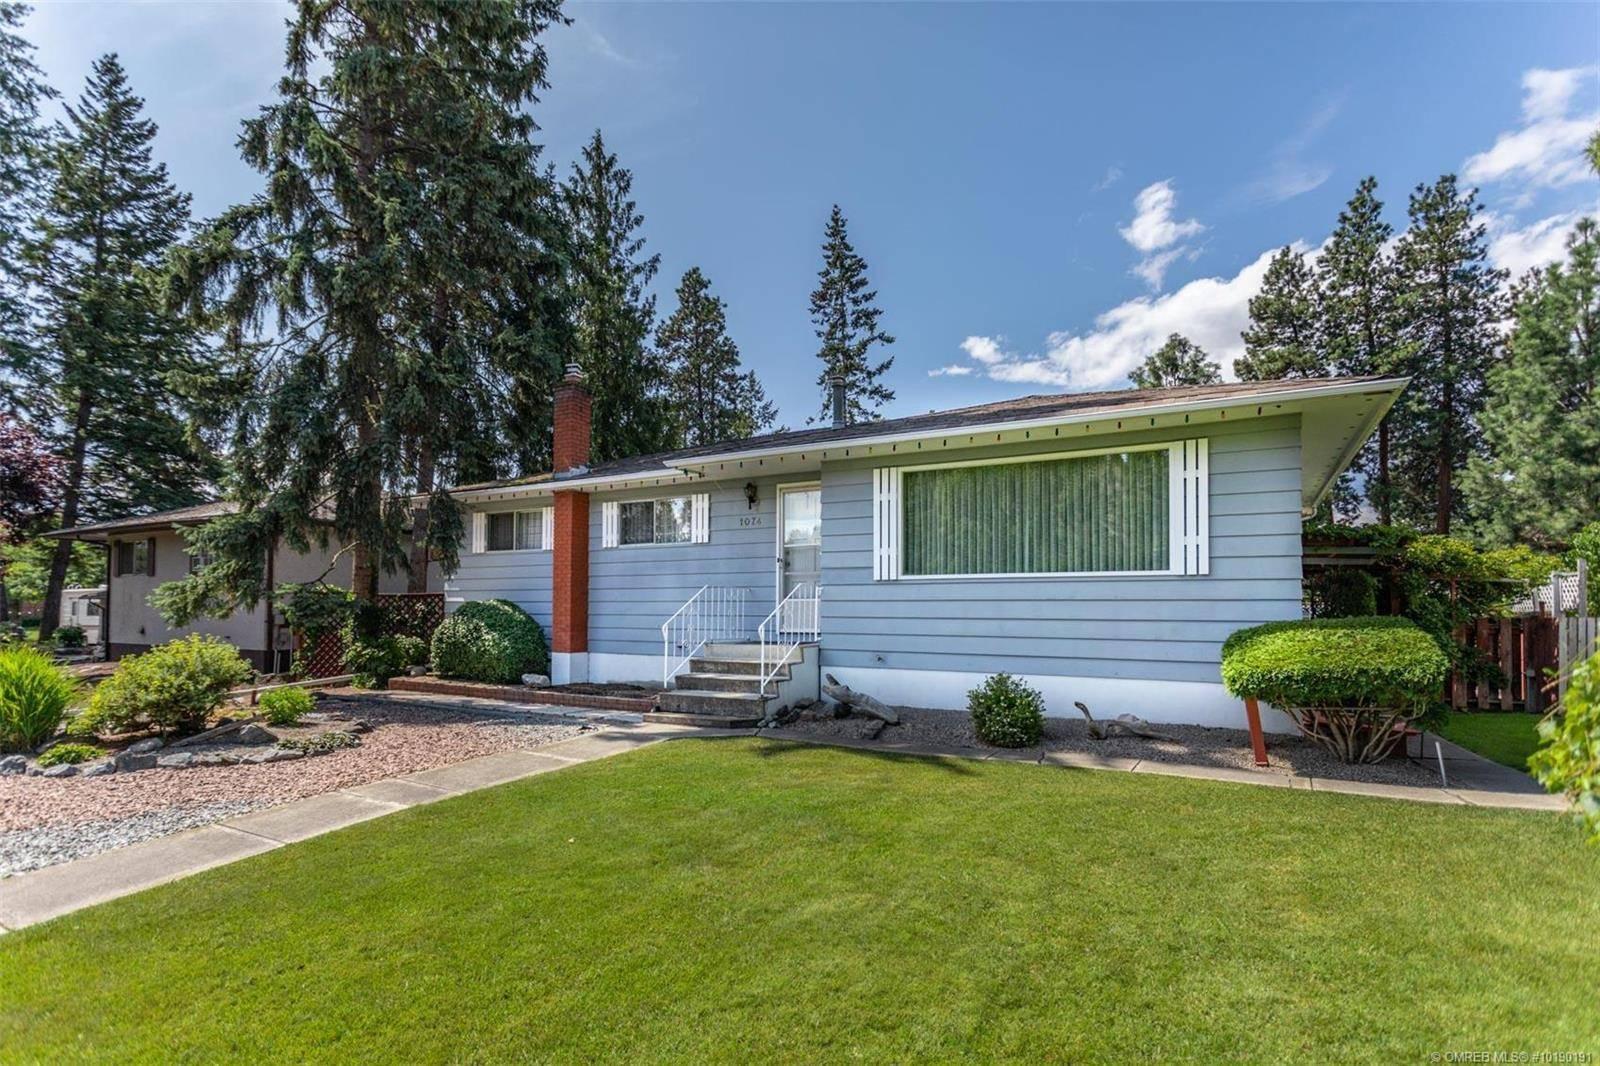 House for sale at 1074 Glenmore Rd Kelowna British Columbia - MLS: 10190191